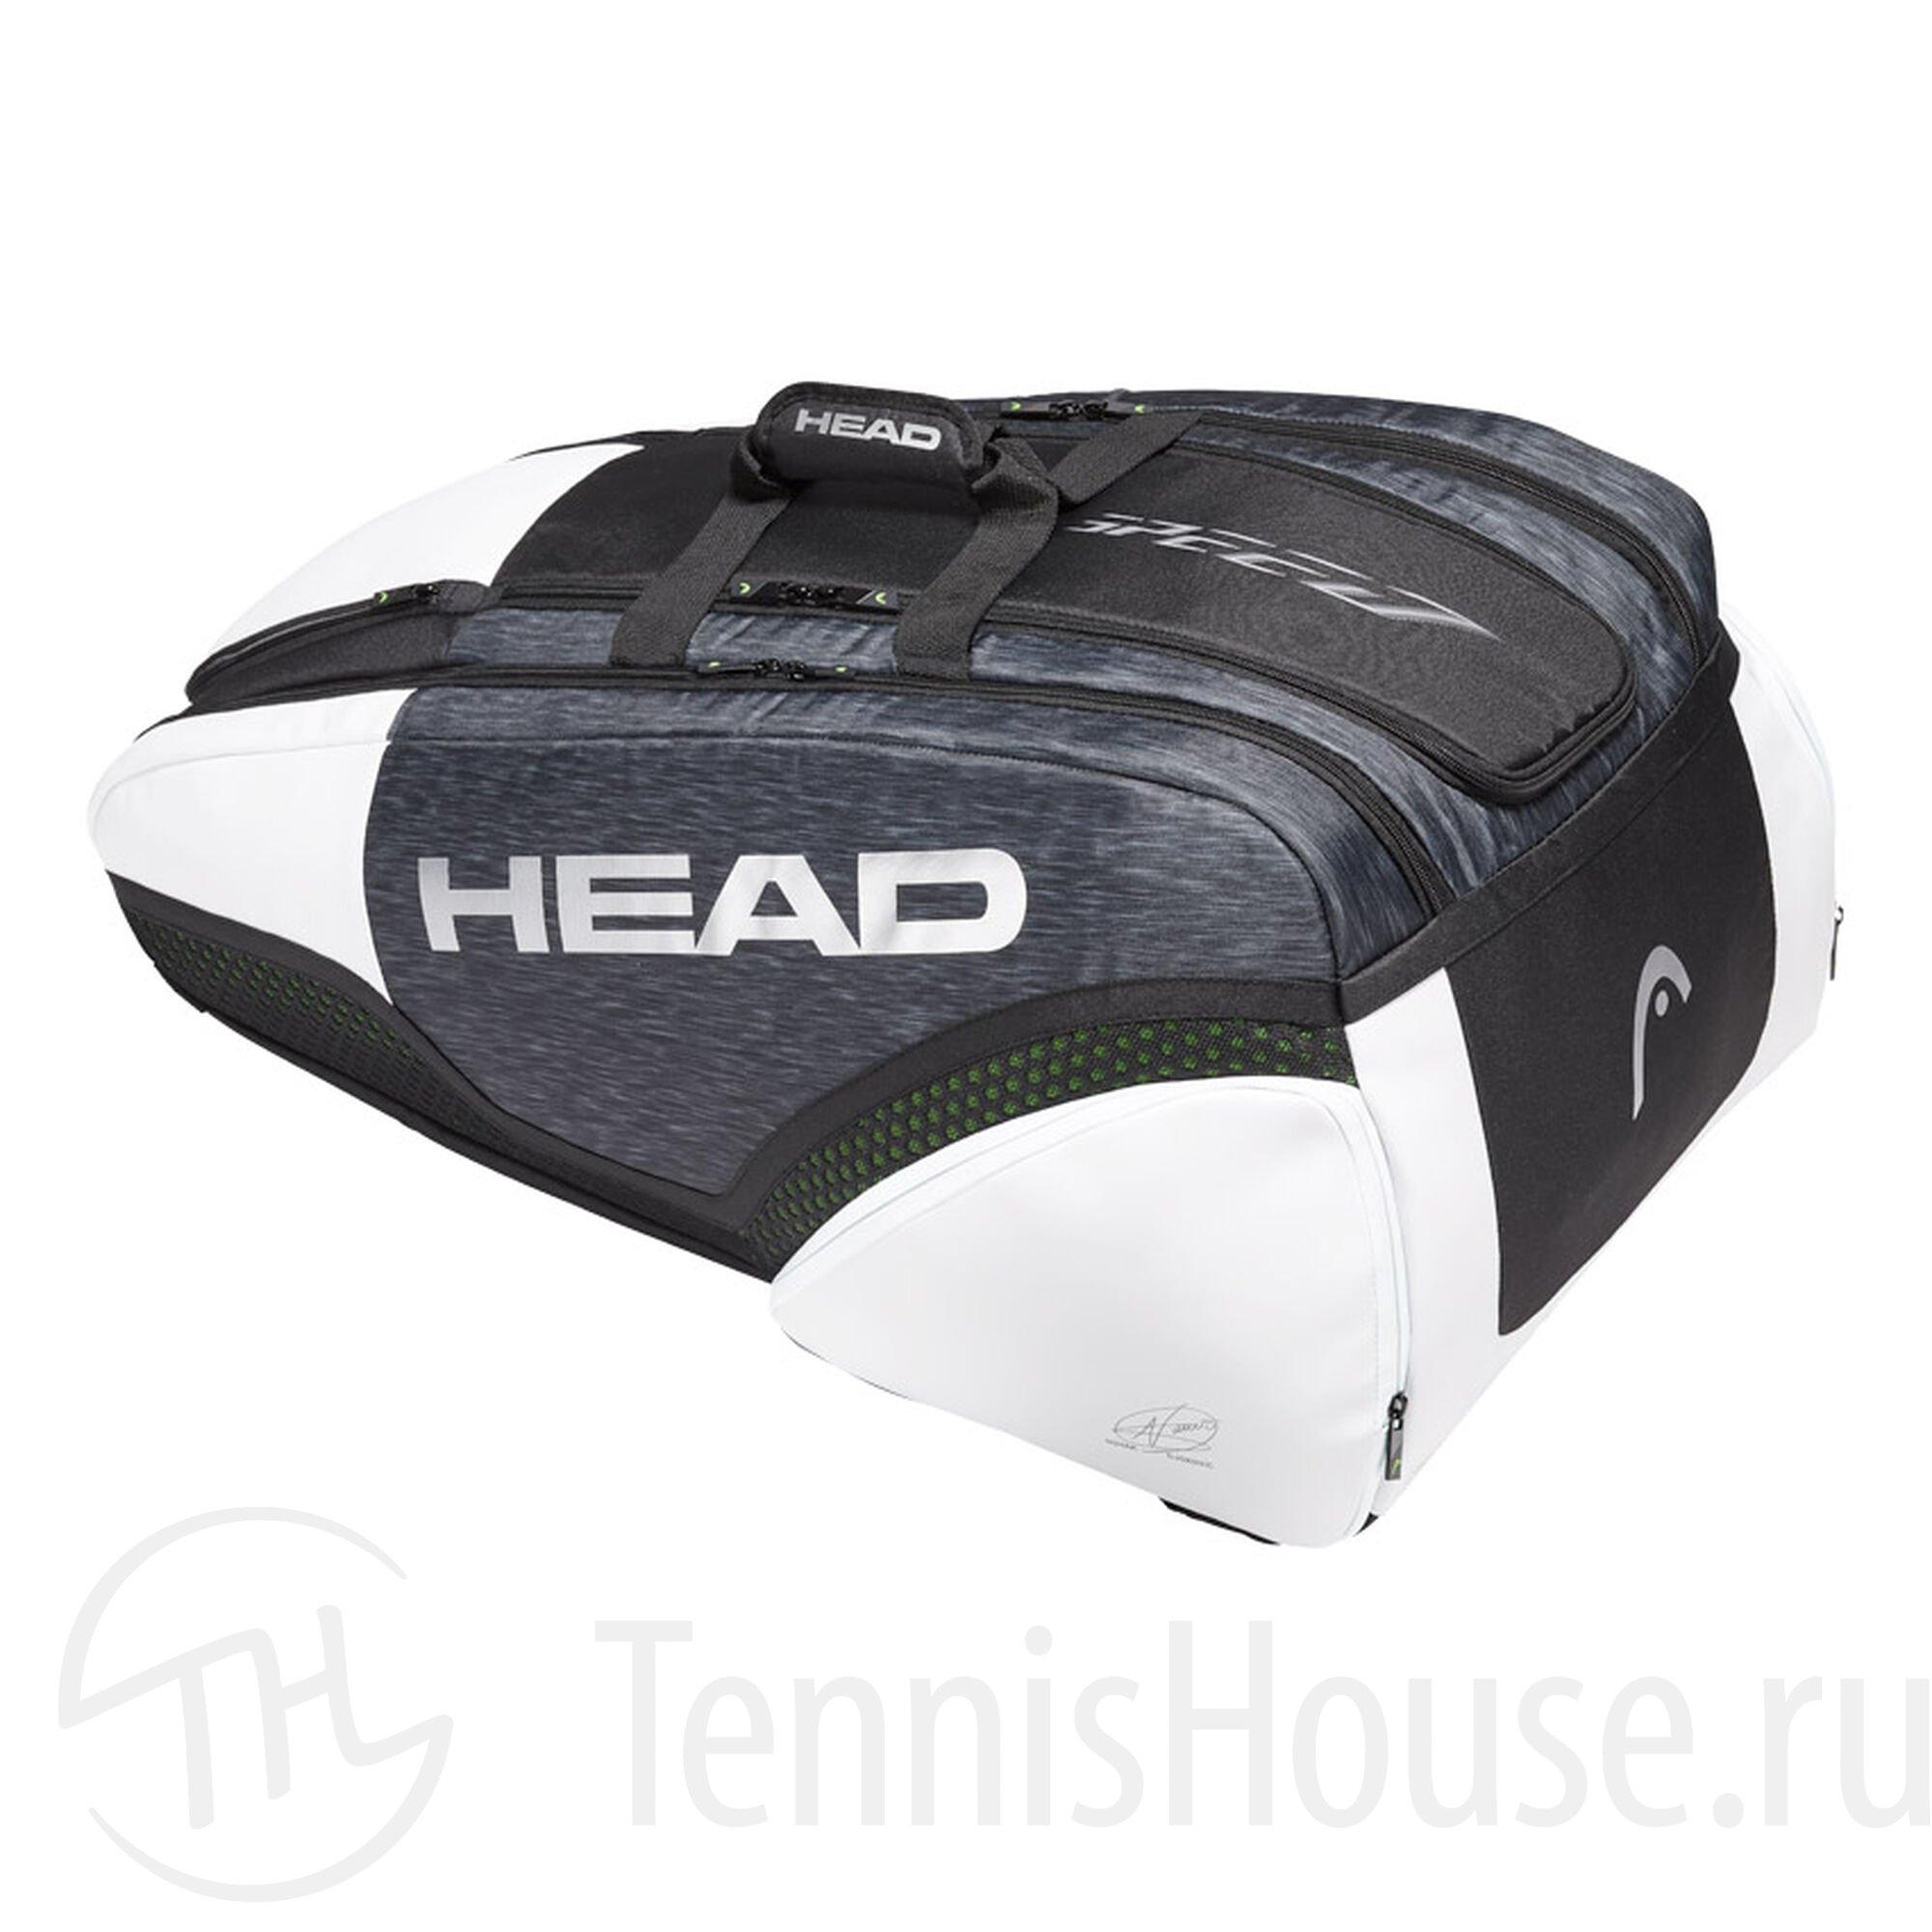 Сумка Head Djokovic Monstercombi 12R 283009